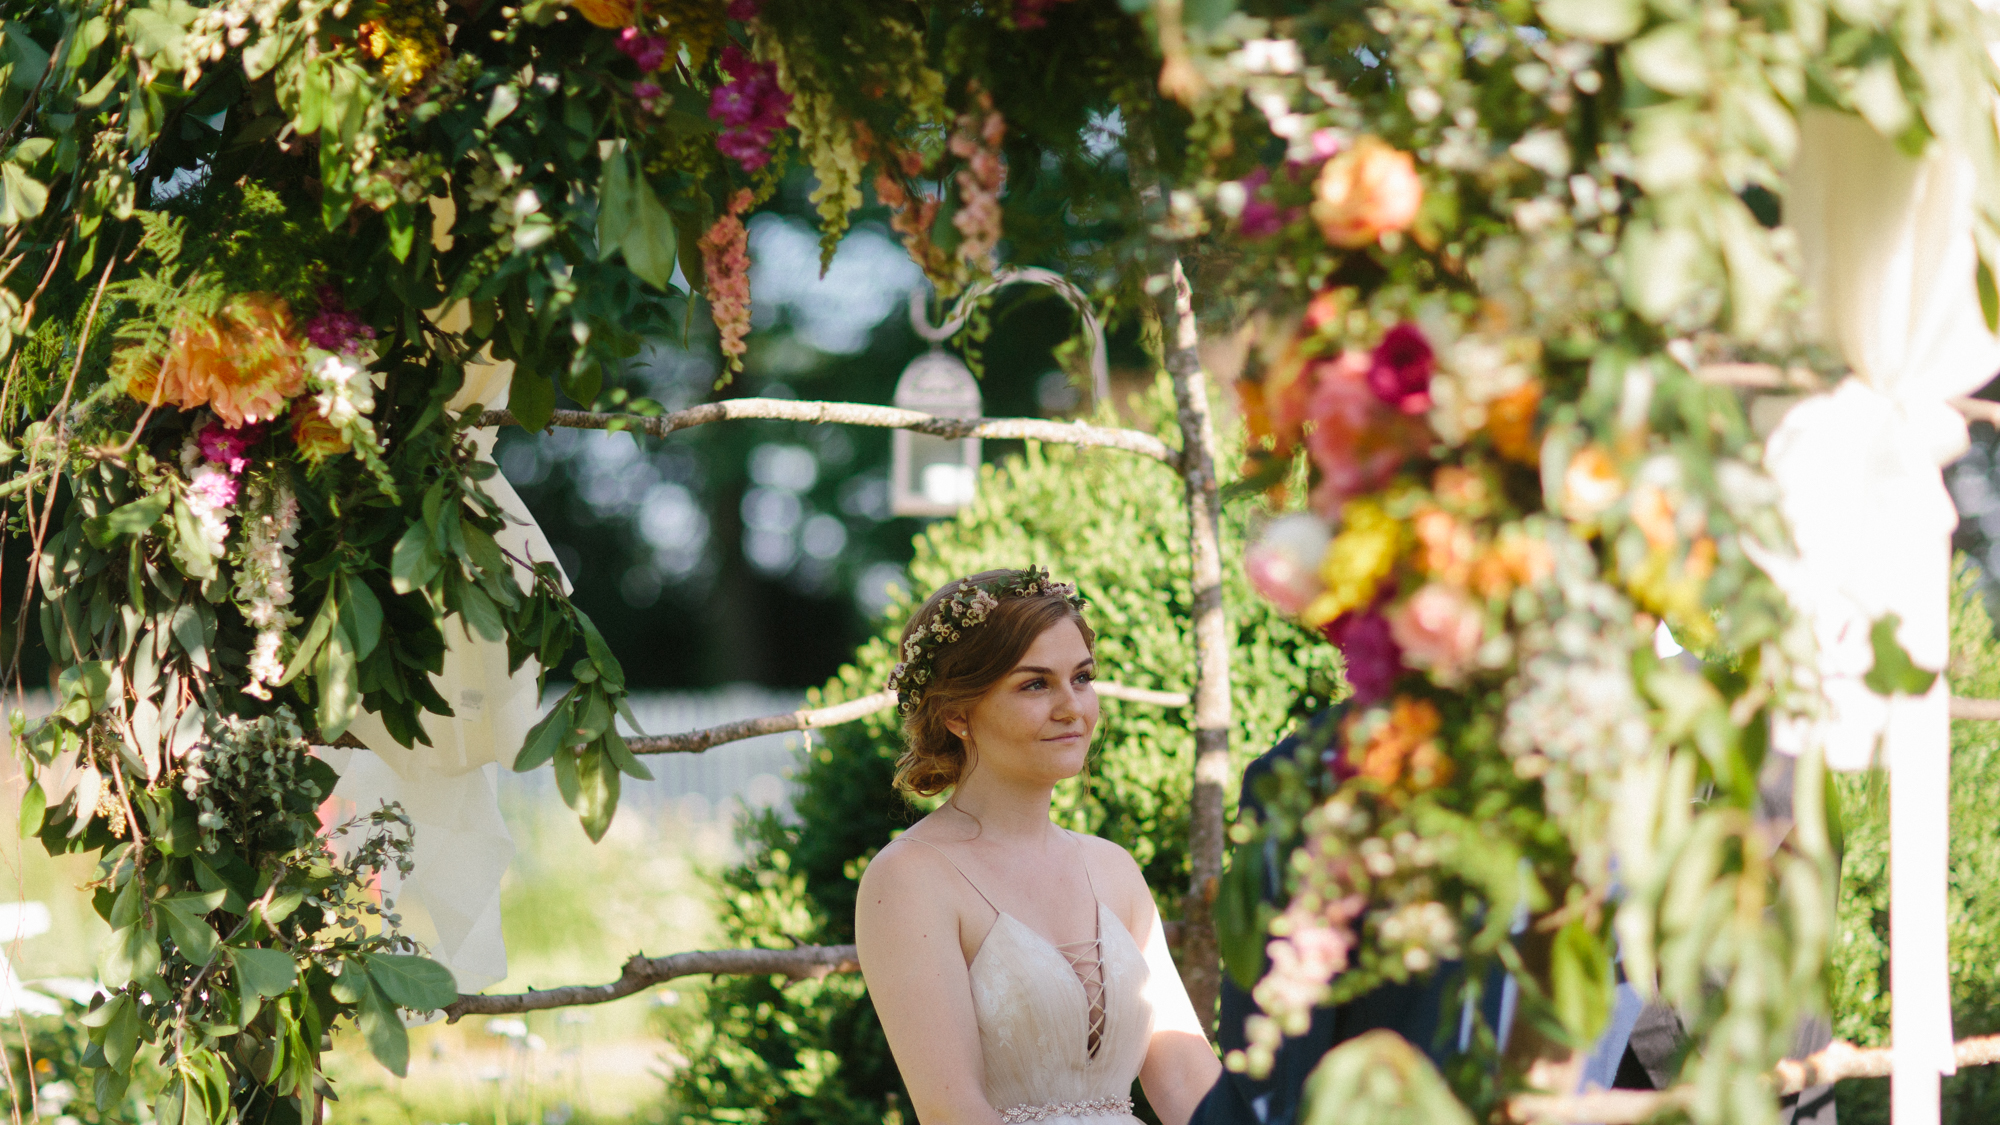 alec_vanderboom_kansas_city_mo_wedding_photos-0044.jpg